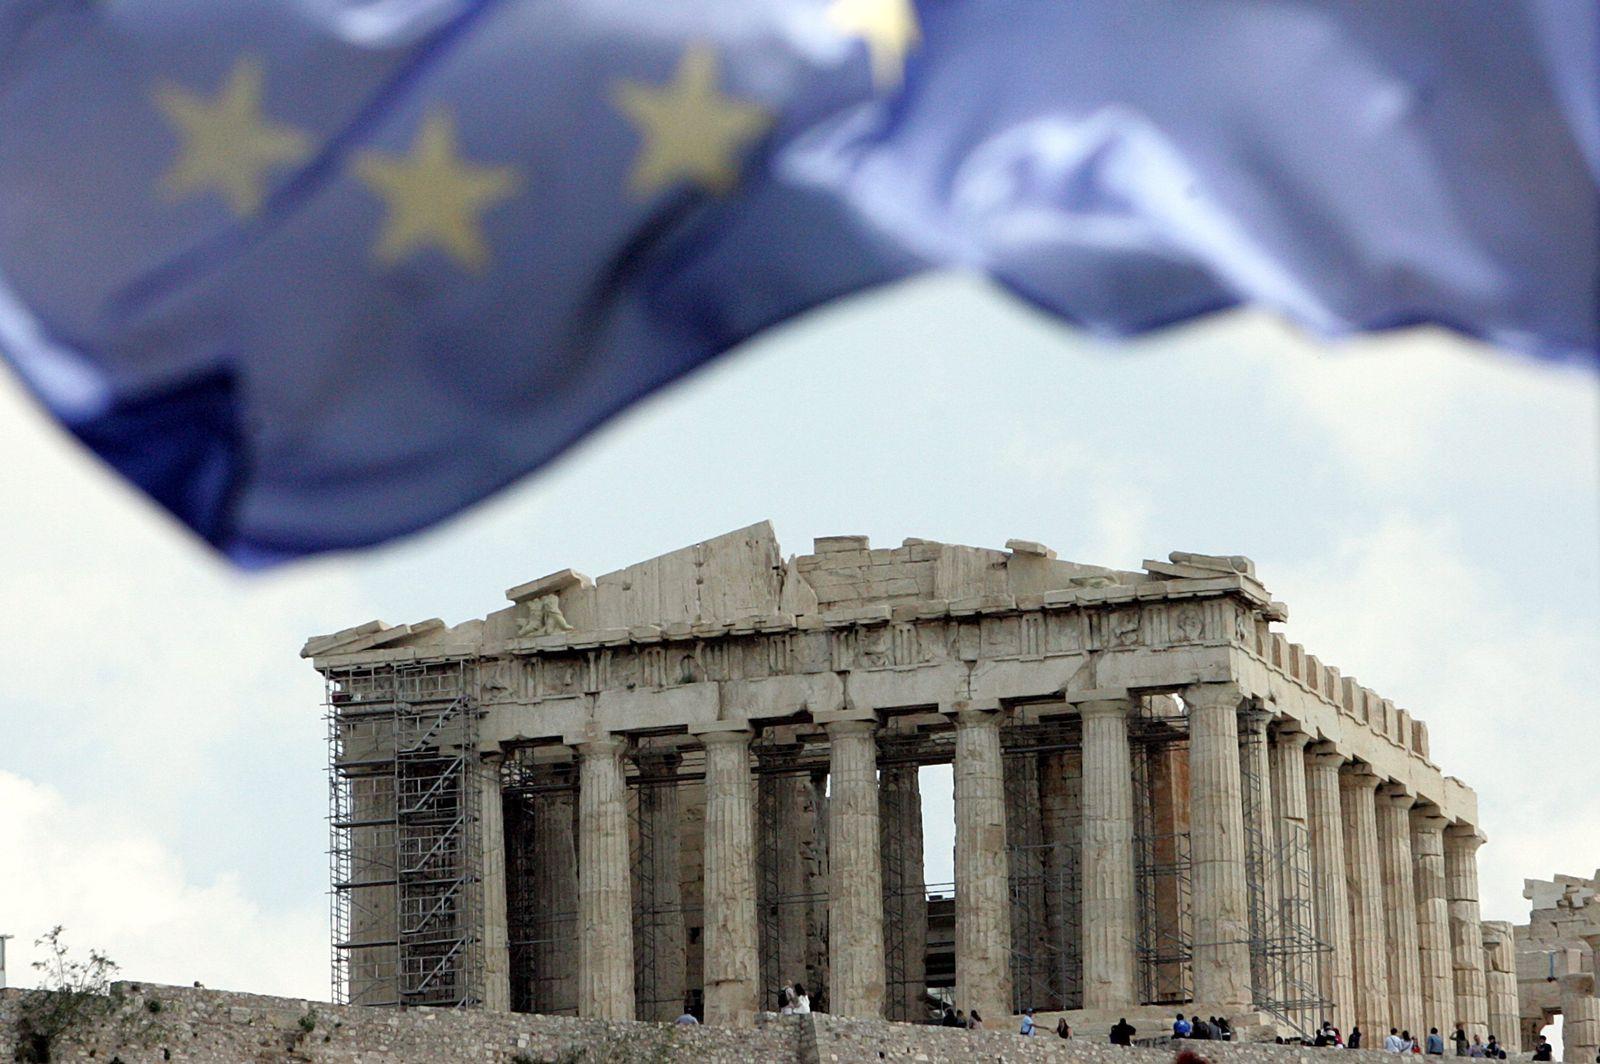 Schuldenkrise Griechenland / Akropolis